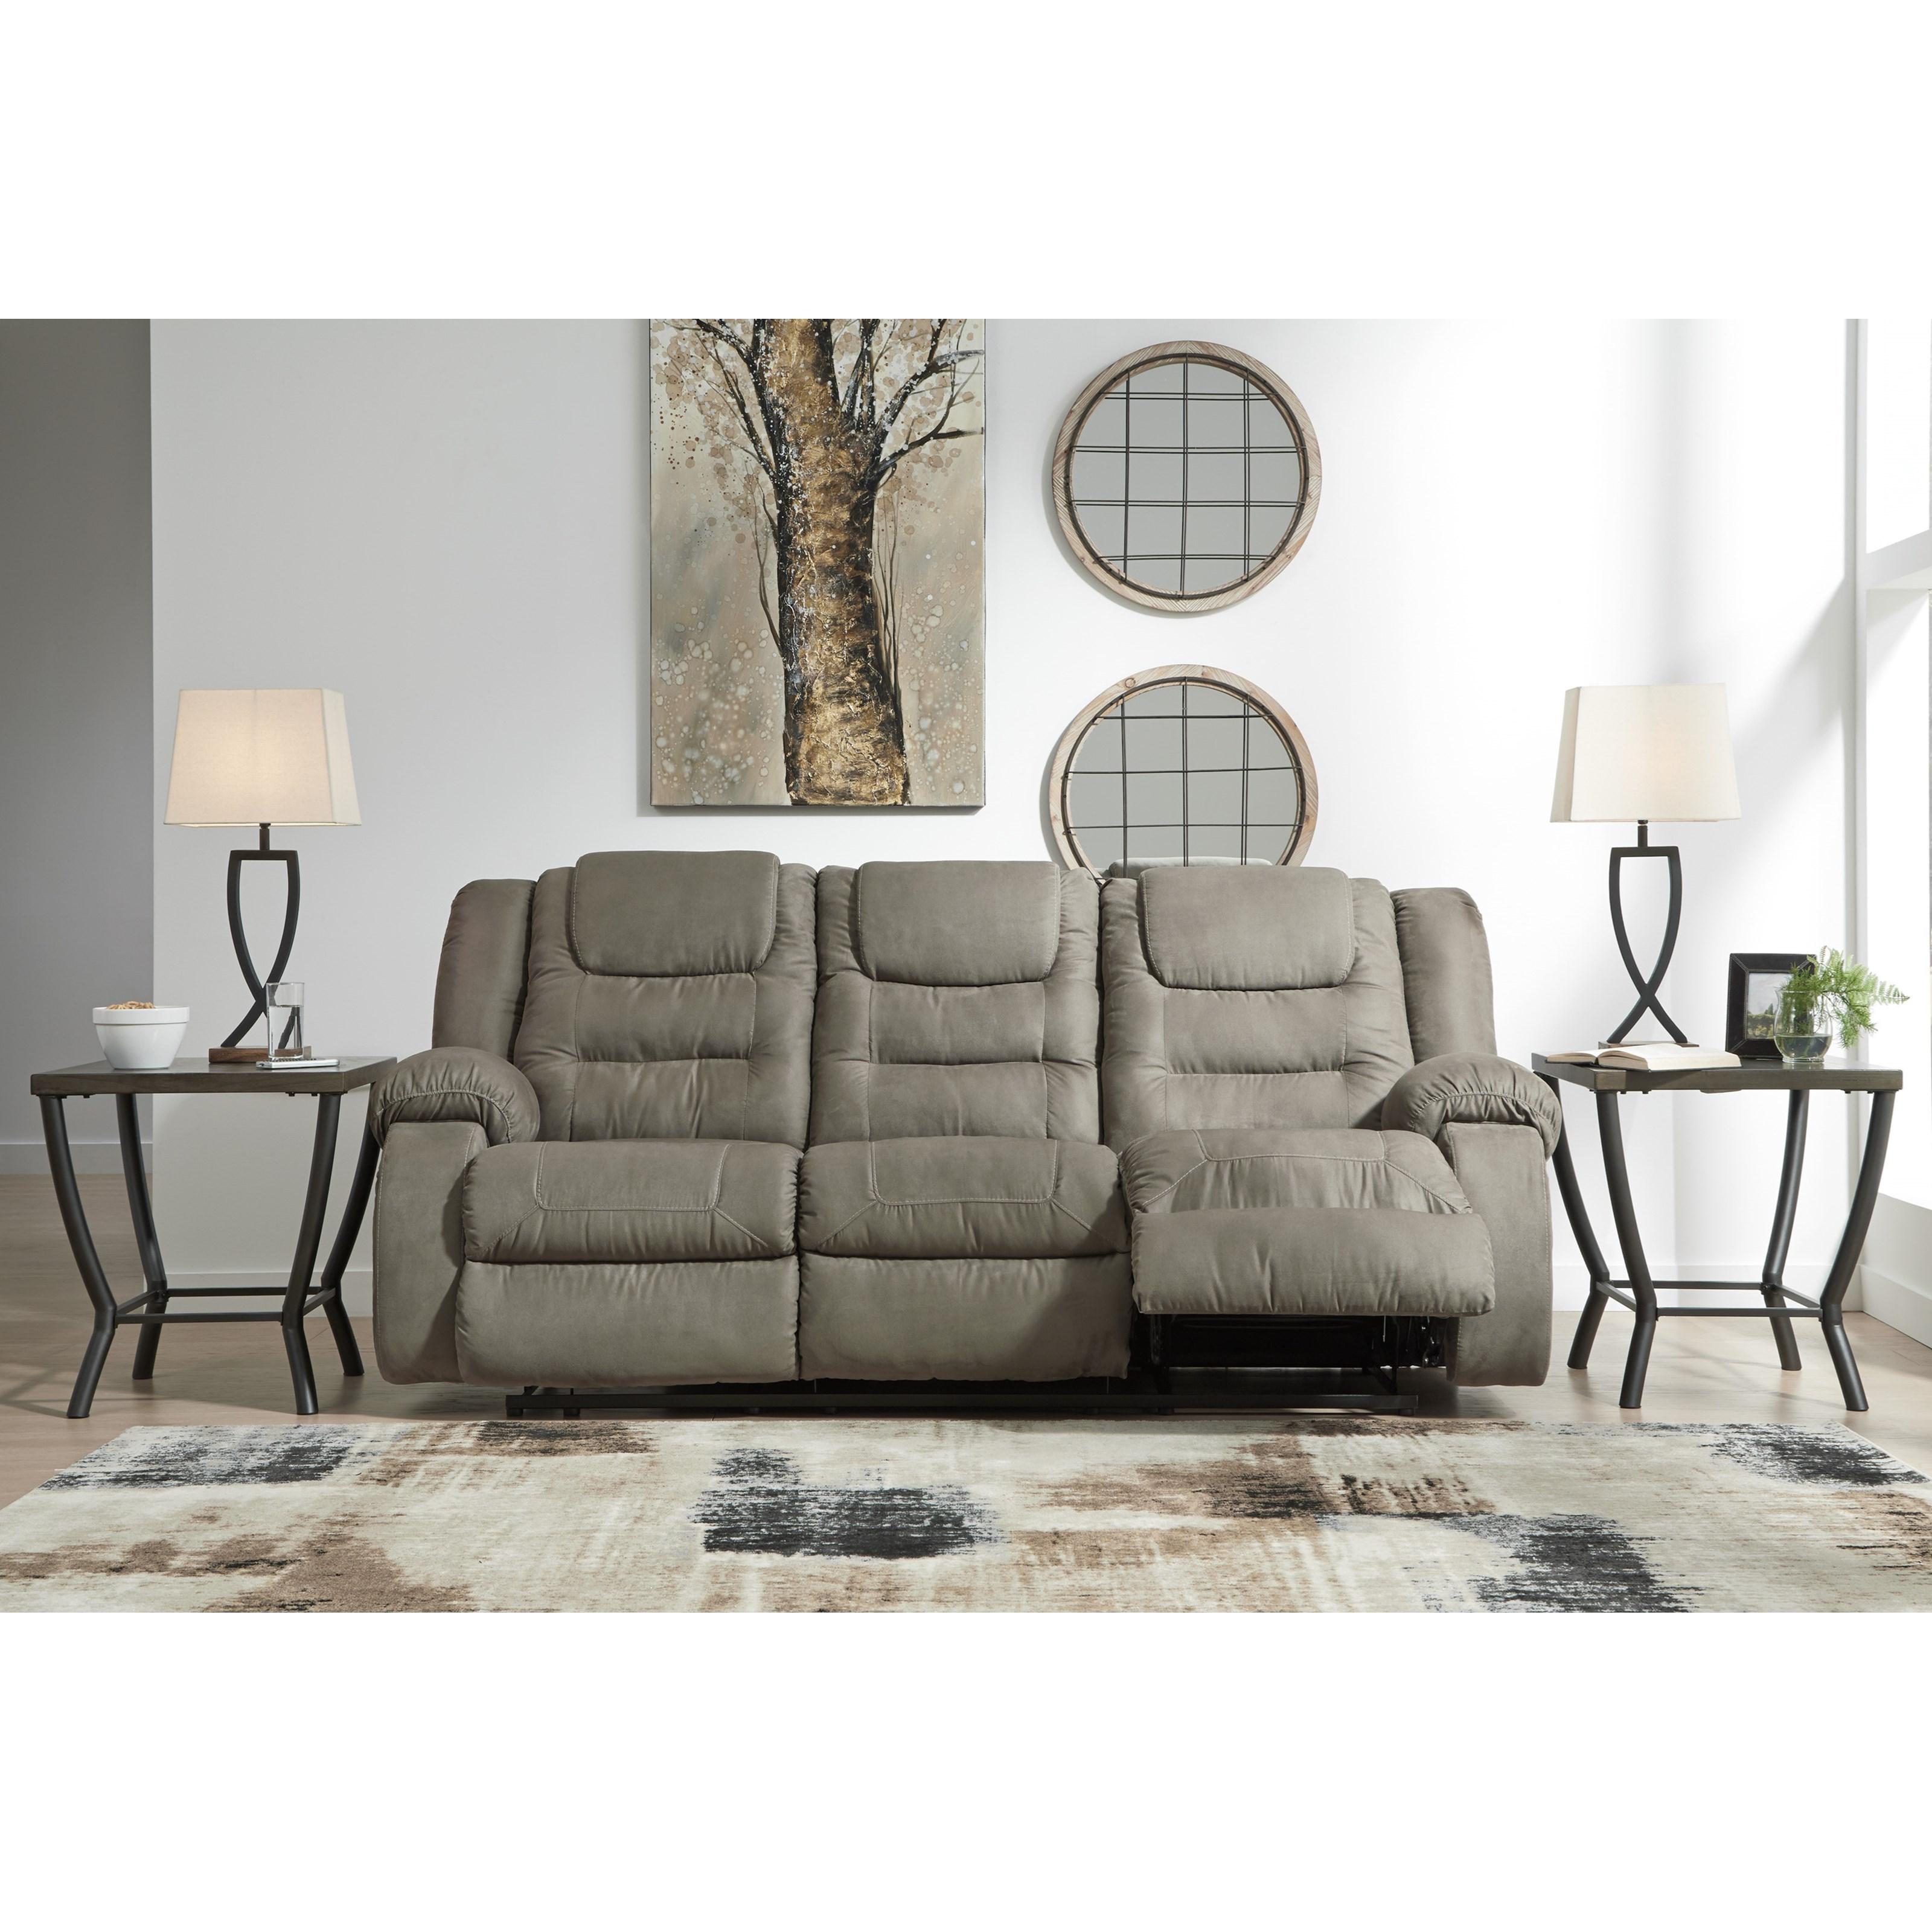 Ashley Furniture Manufacturer: Signature Design By Ashley McCade Casual Reclining Sofa